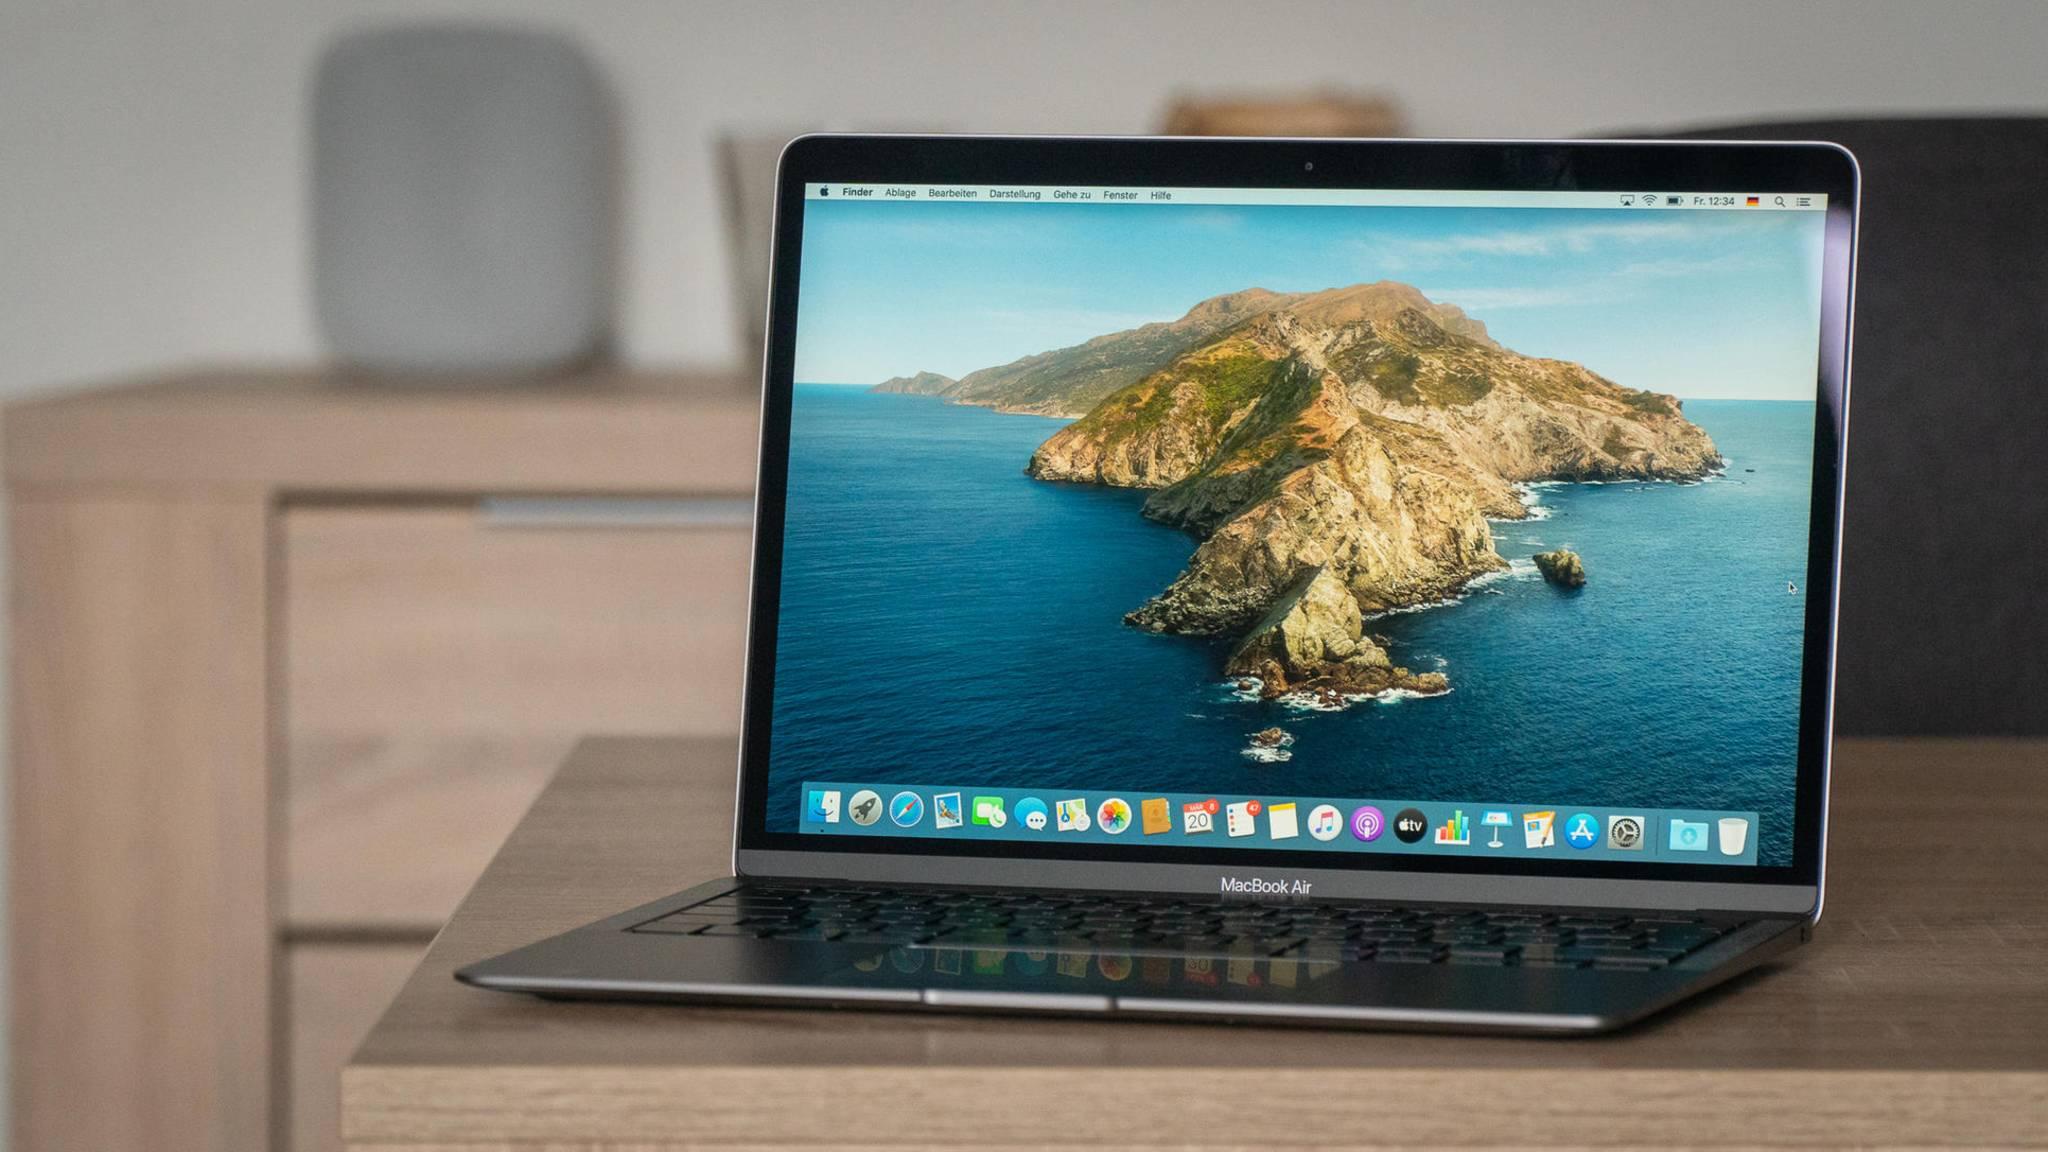 Neues macbook pro 2020